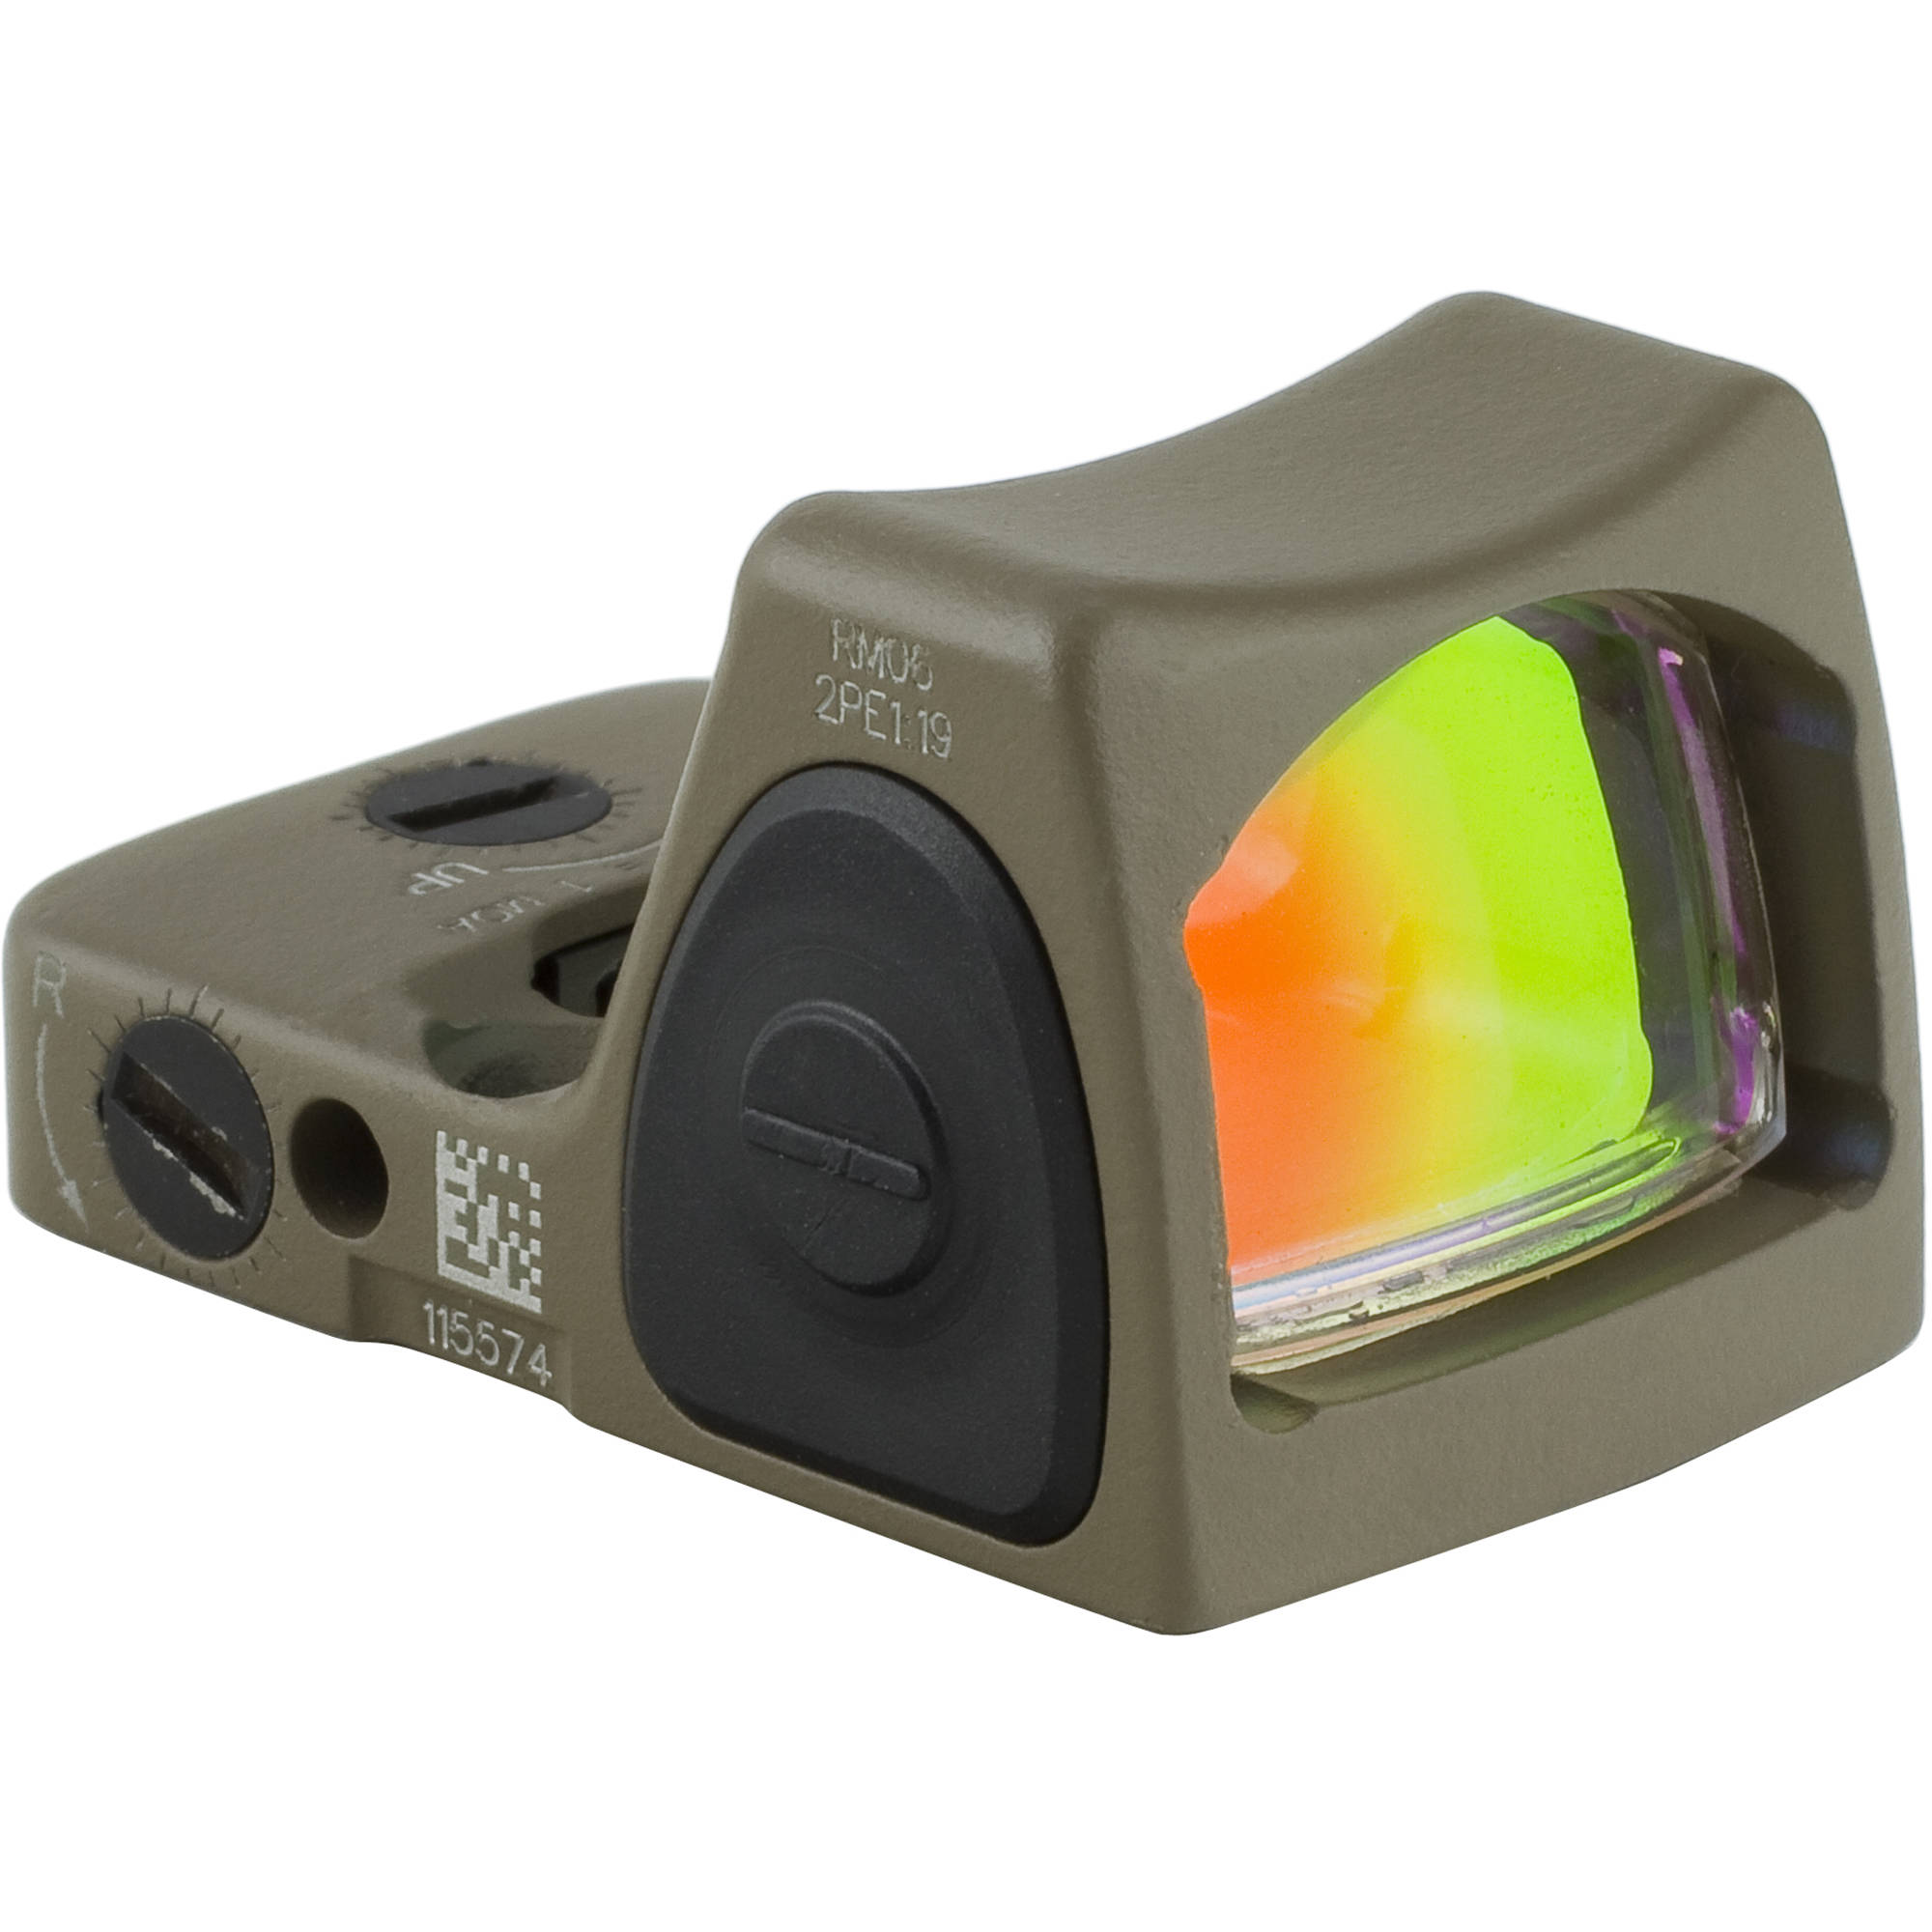 Trijicon RM06 RMR Type 2 Adjustable LED Reflex RM06-C-700696 B&H